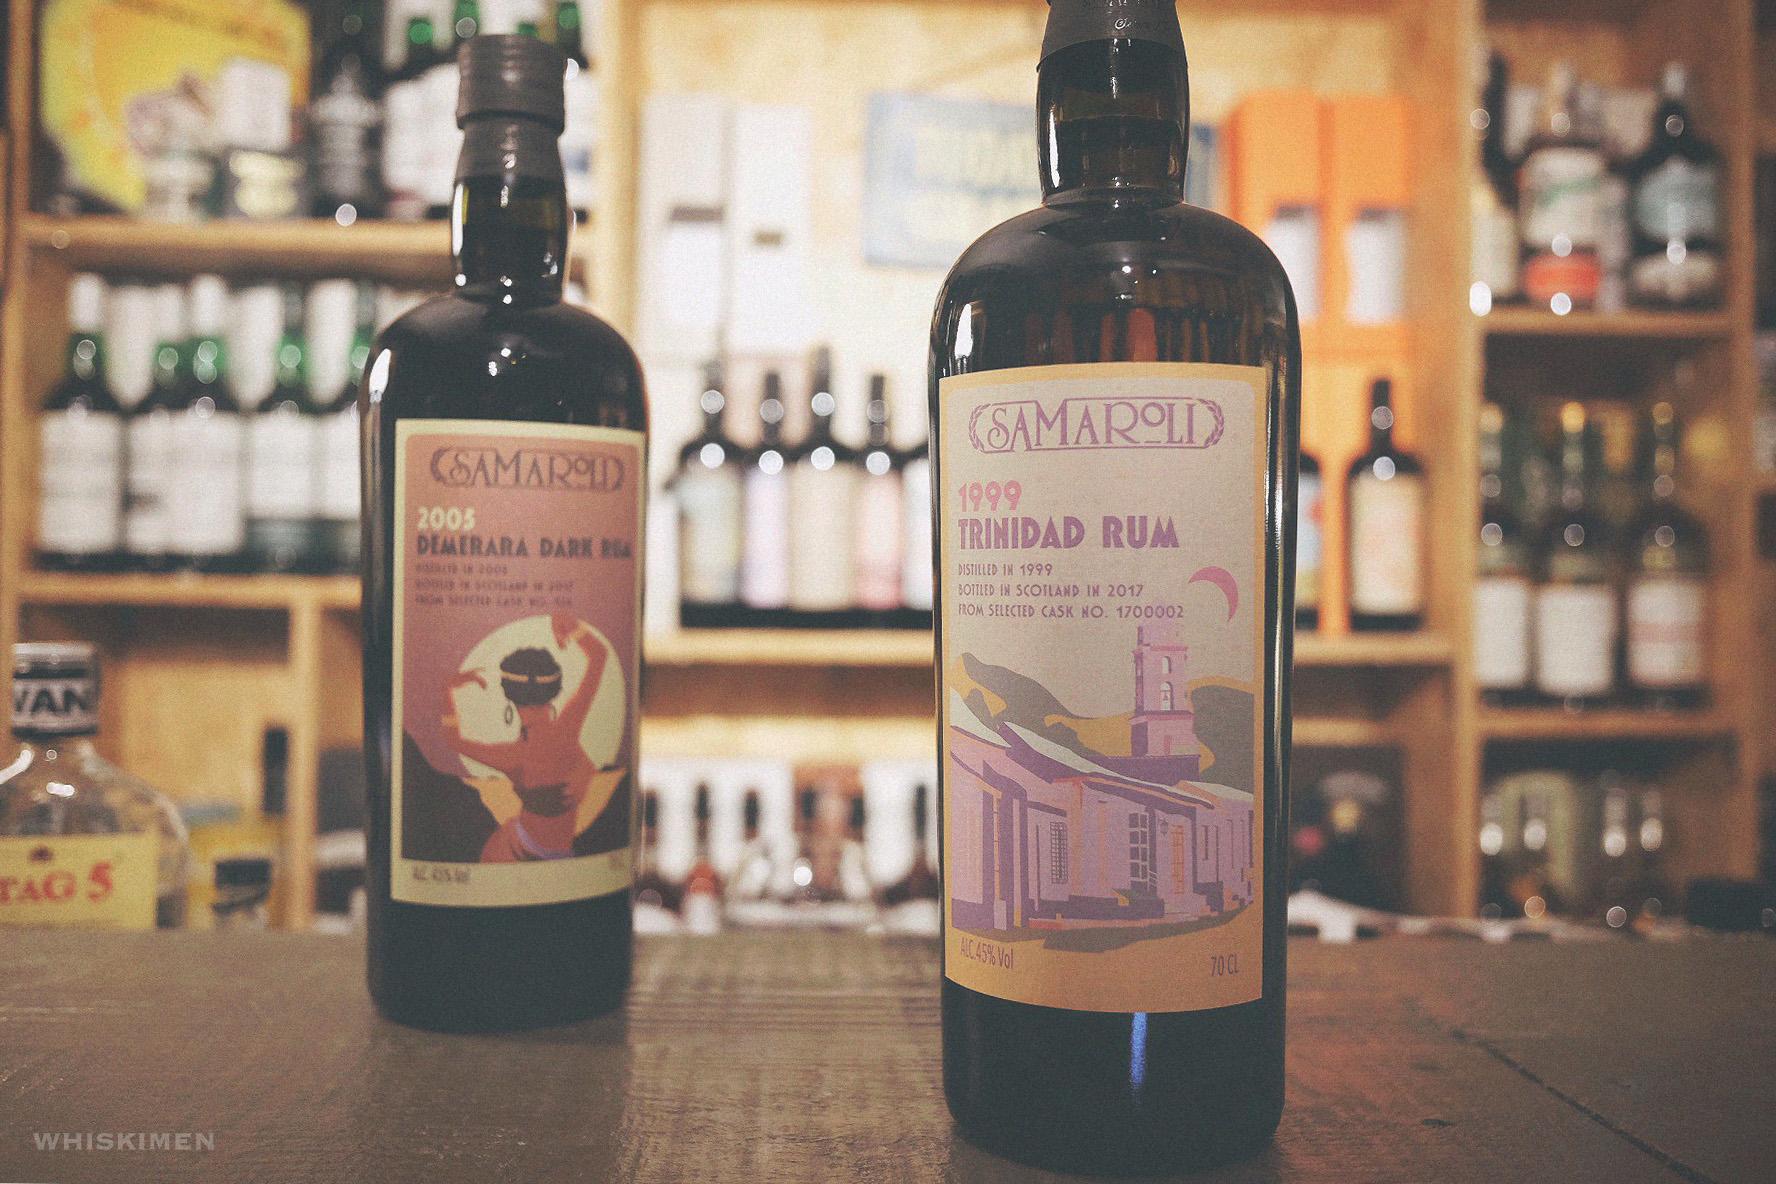 Samaroli 1999 18 Year Old Trinidad Rum